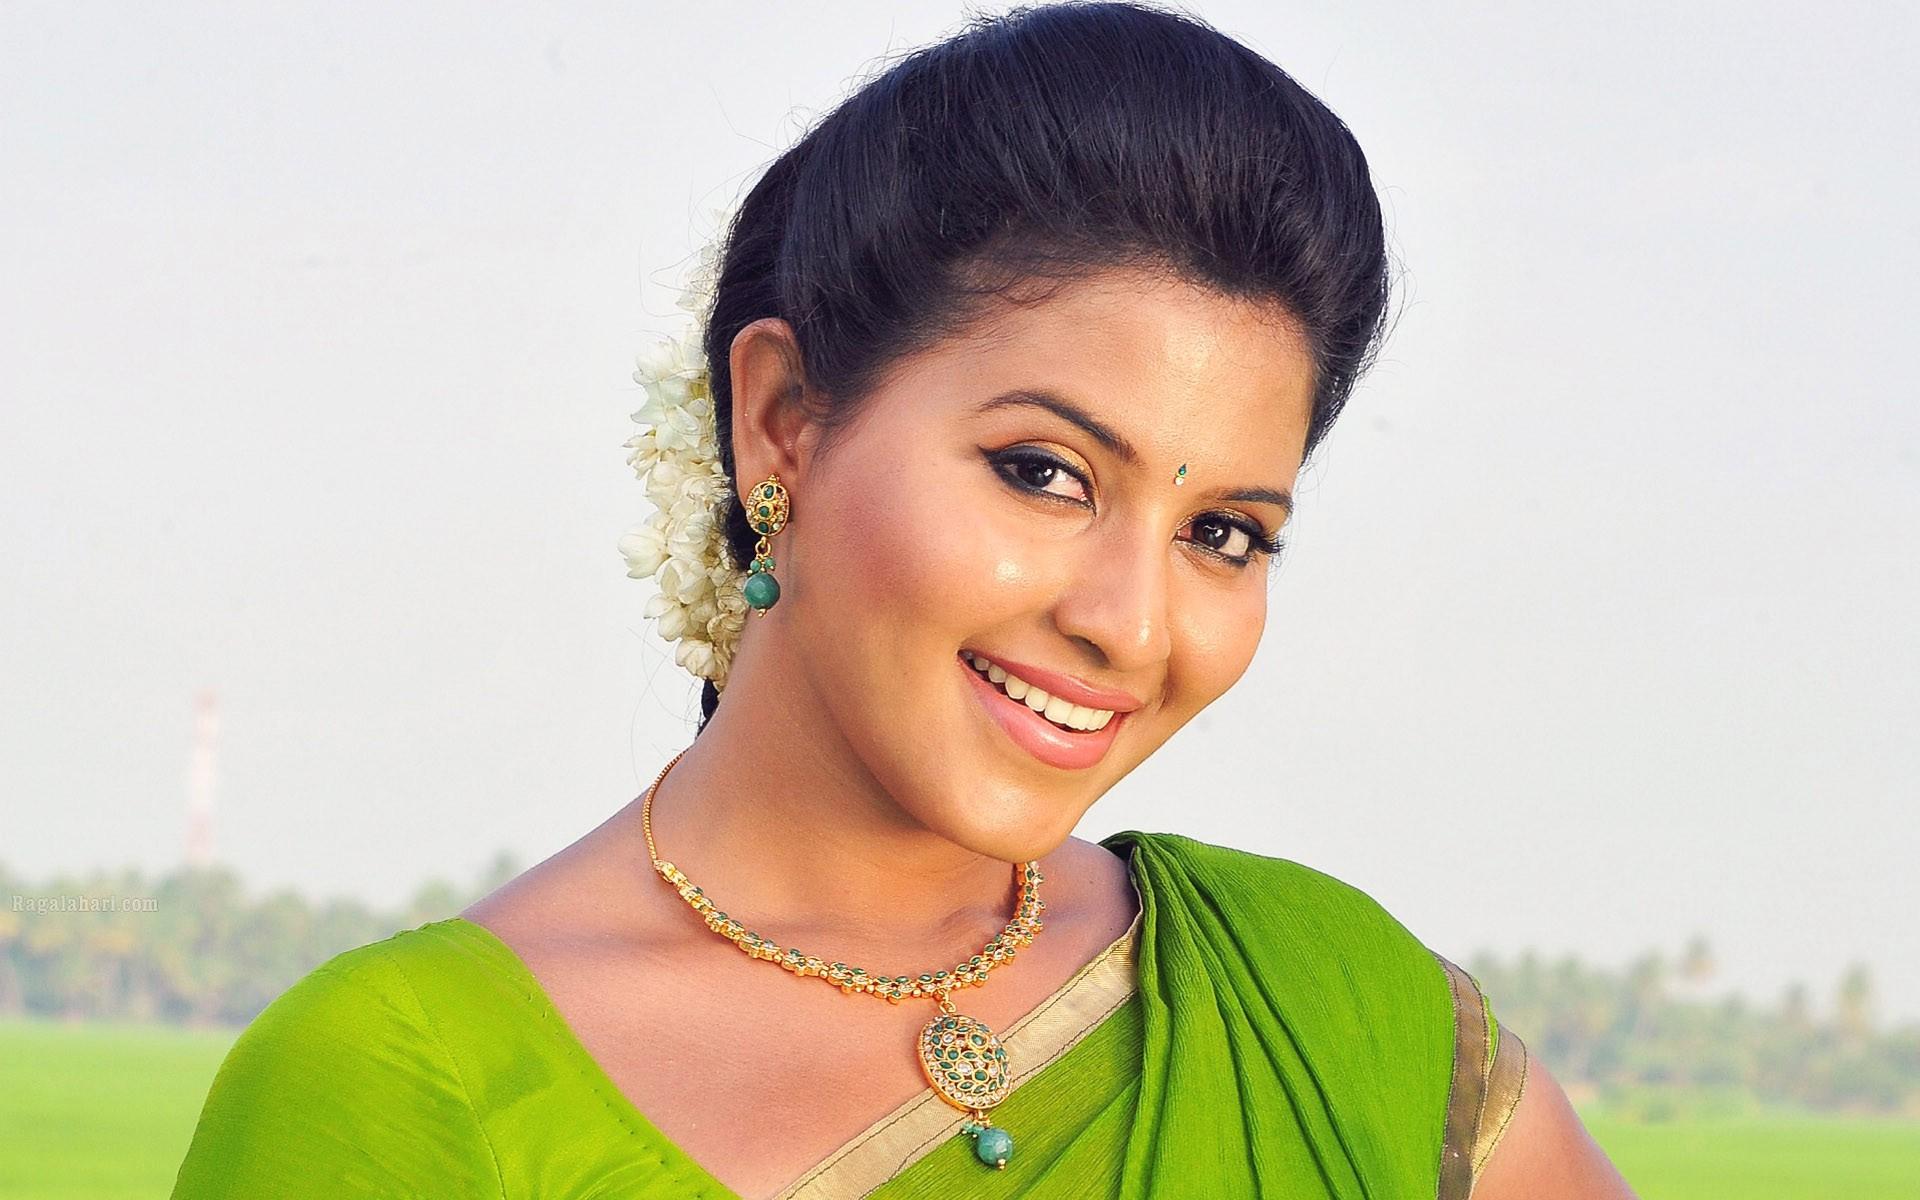 Tamil Actress HD Wallpapers 1080p - Wallpaper Cave